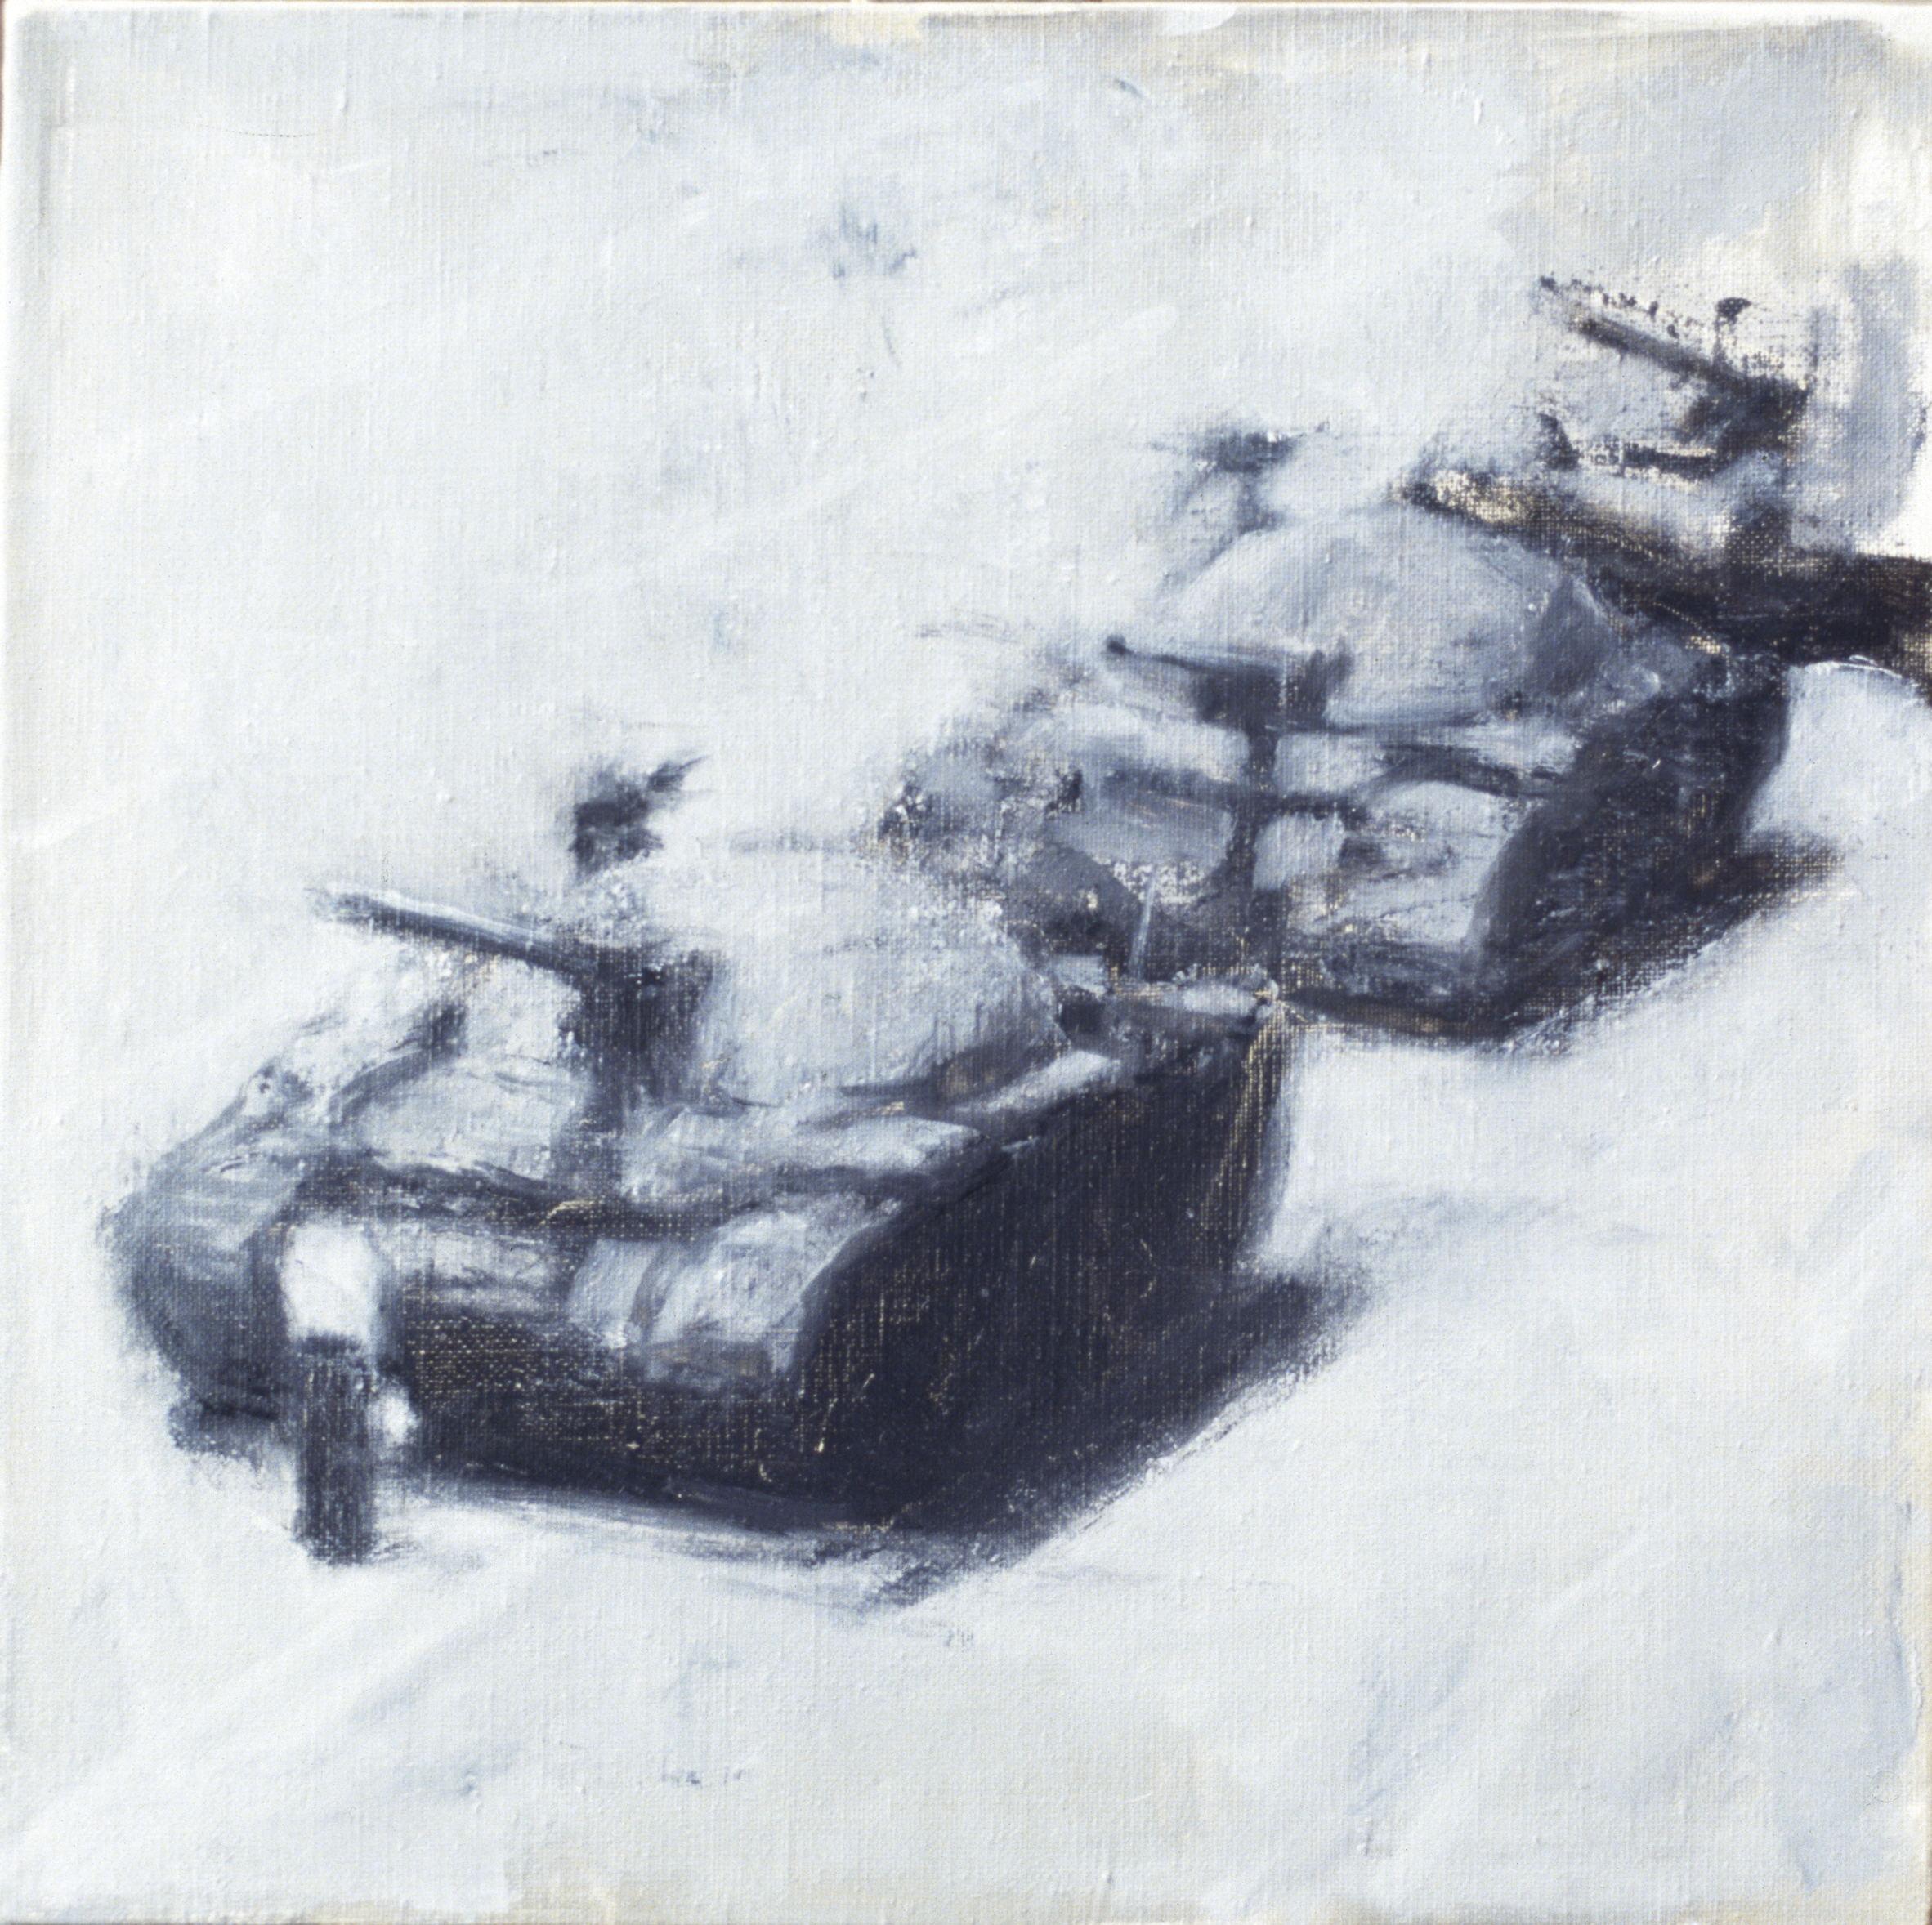 Tank Man (Tiananmen Square), 1989, oil on linen, 300 x 300mm